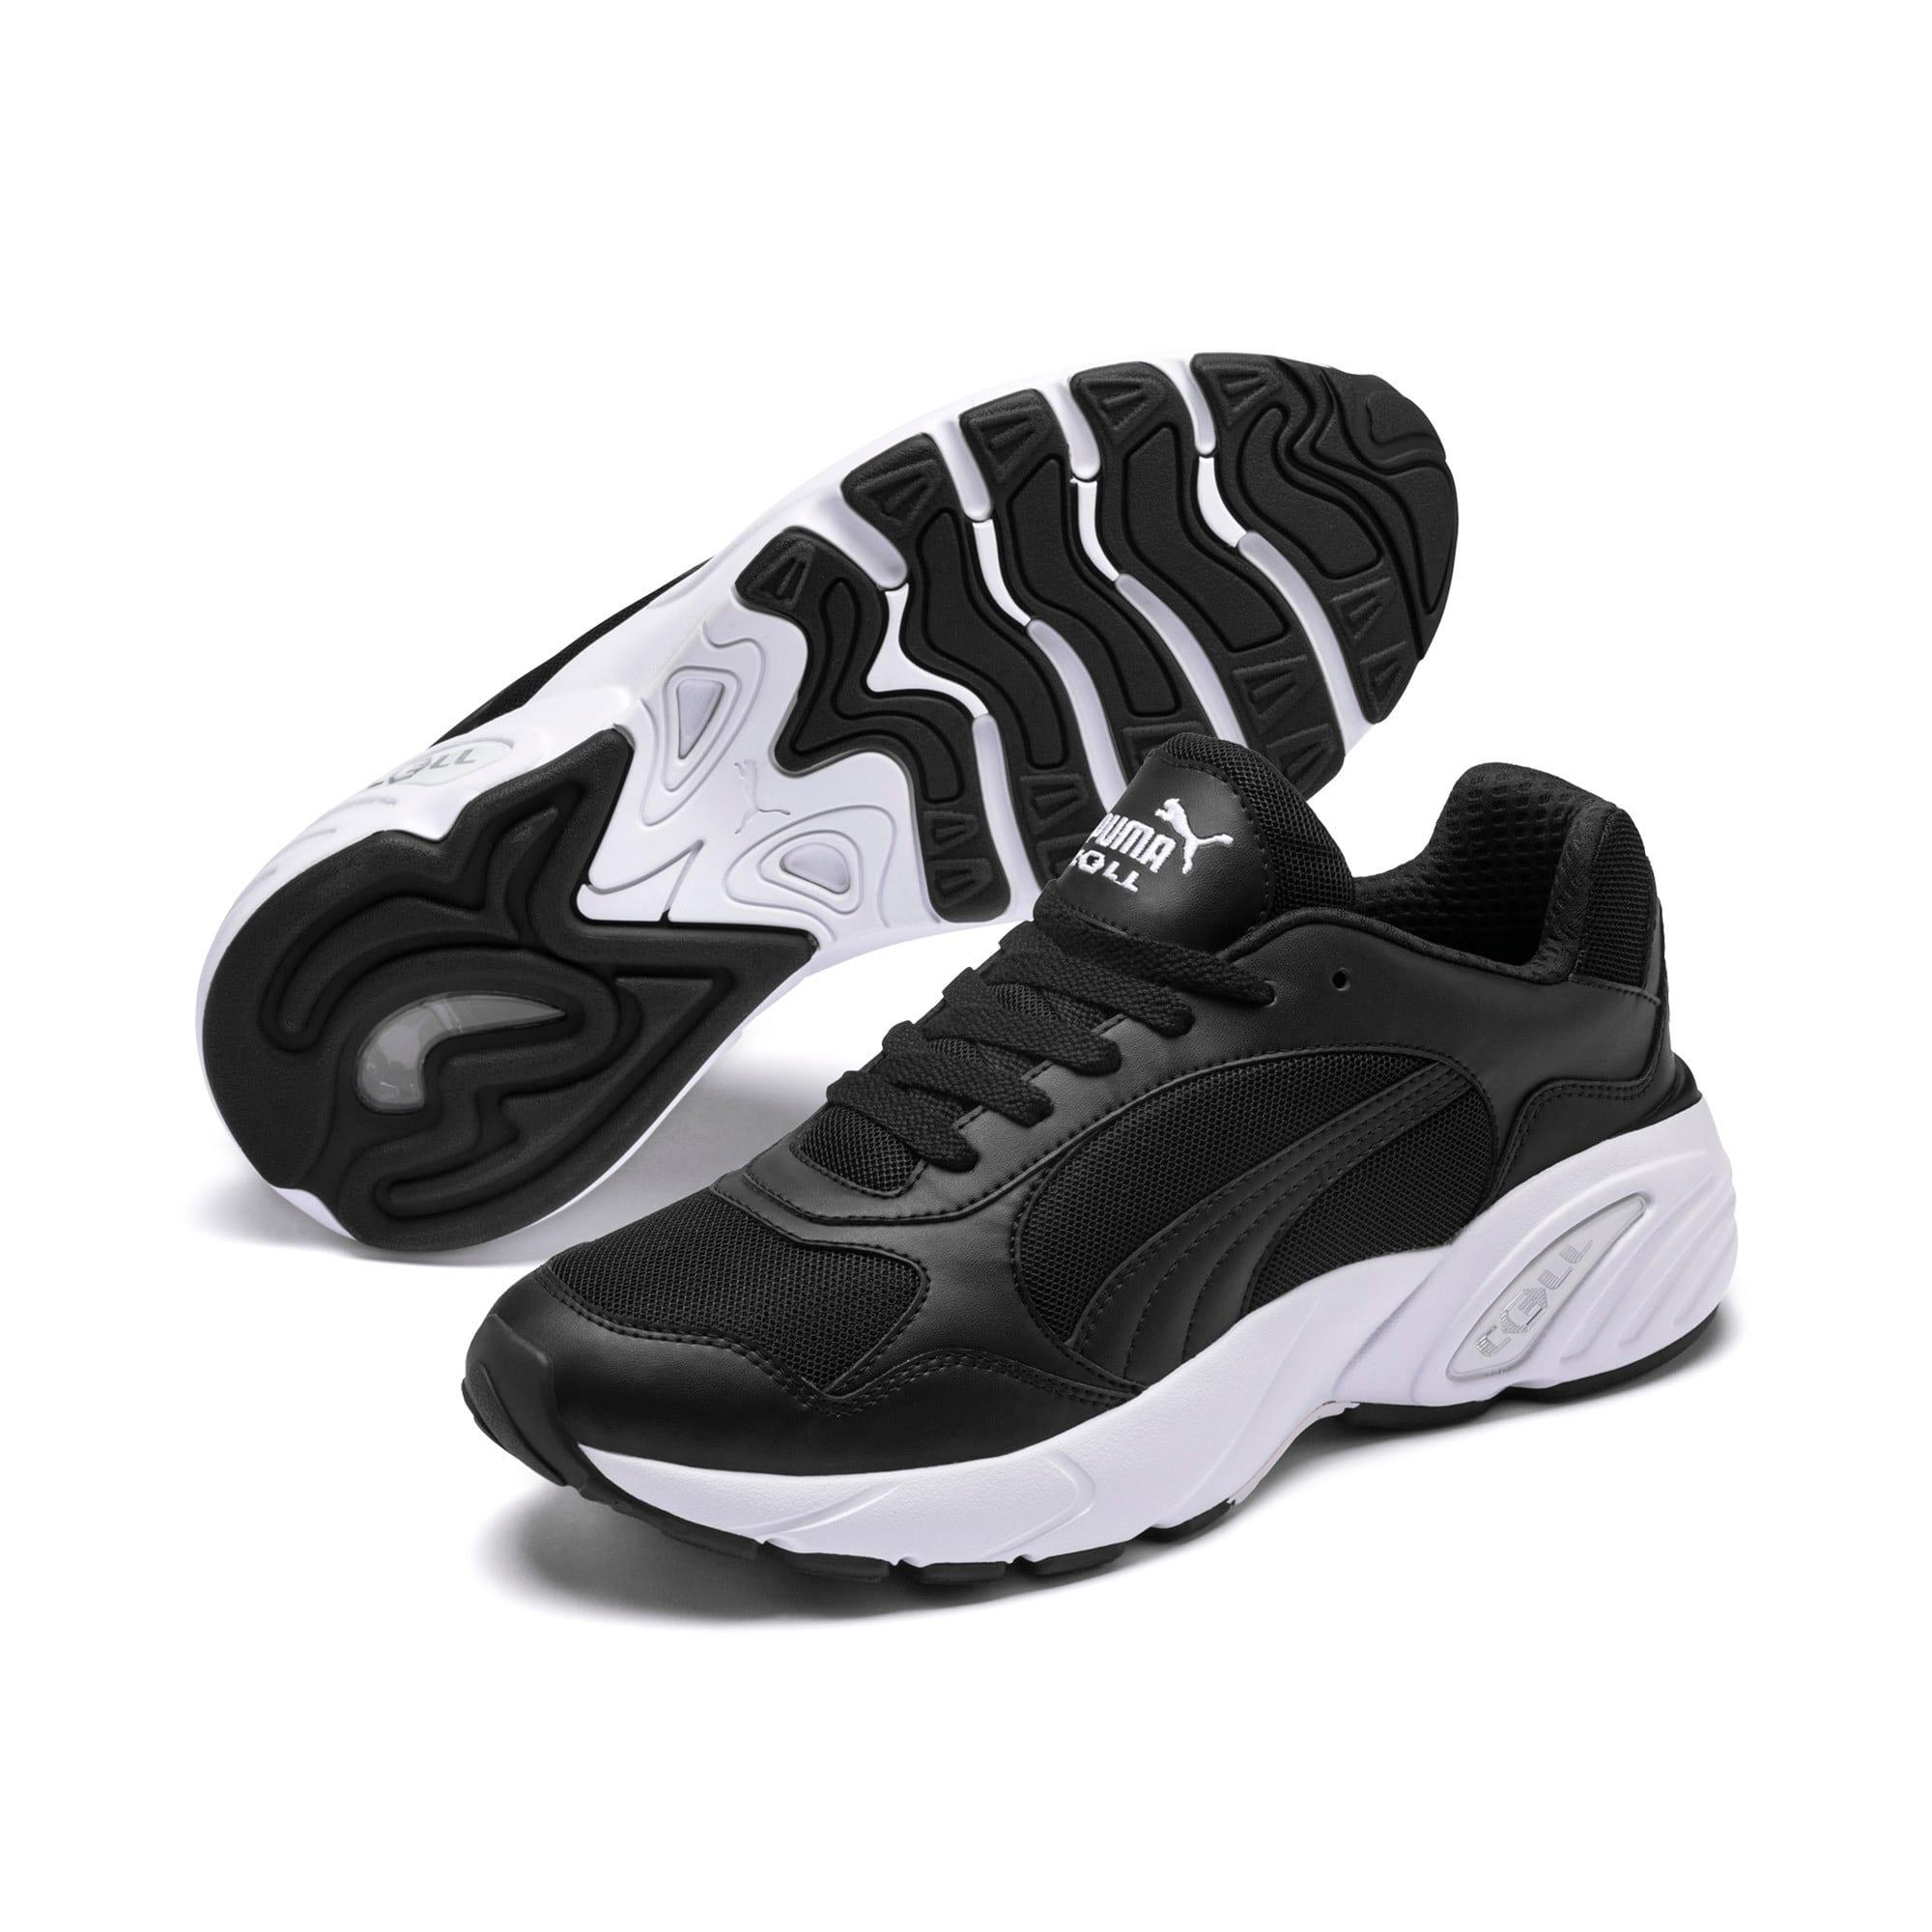 Thumbnail 2 of CELL Viper Sneakers, Puma Black-Puma White, medium